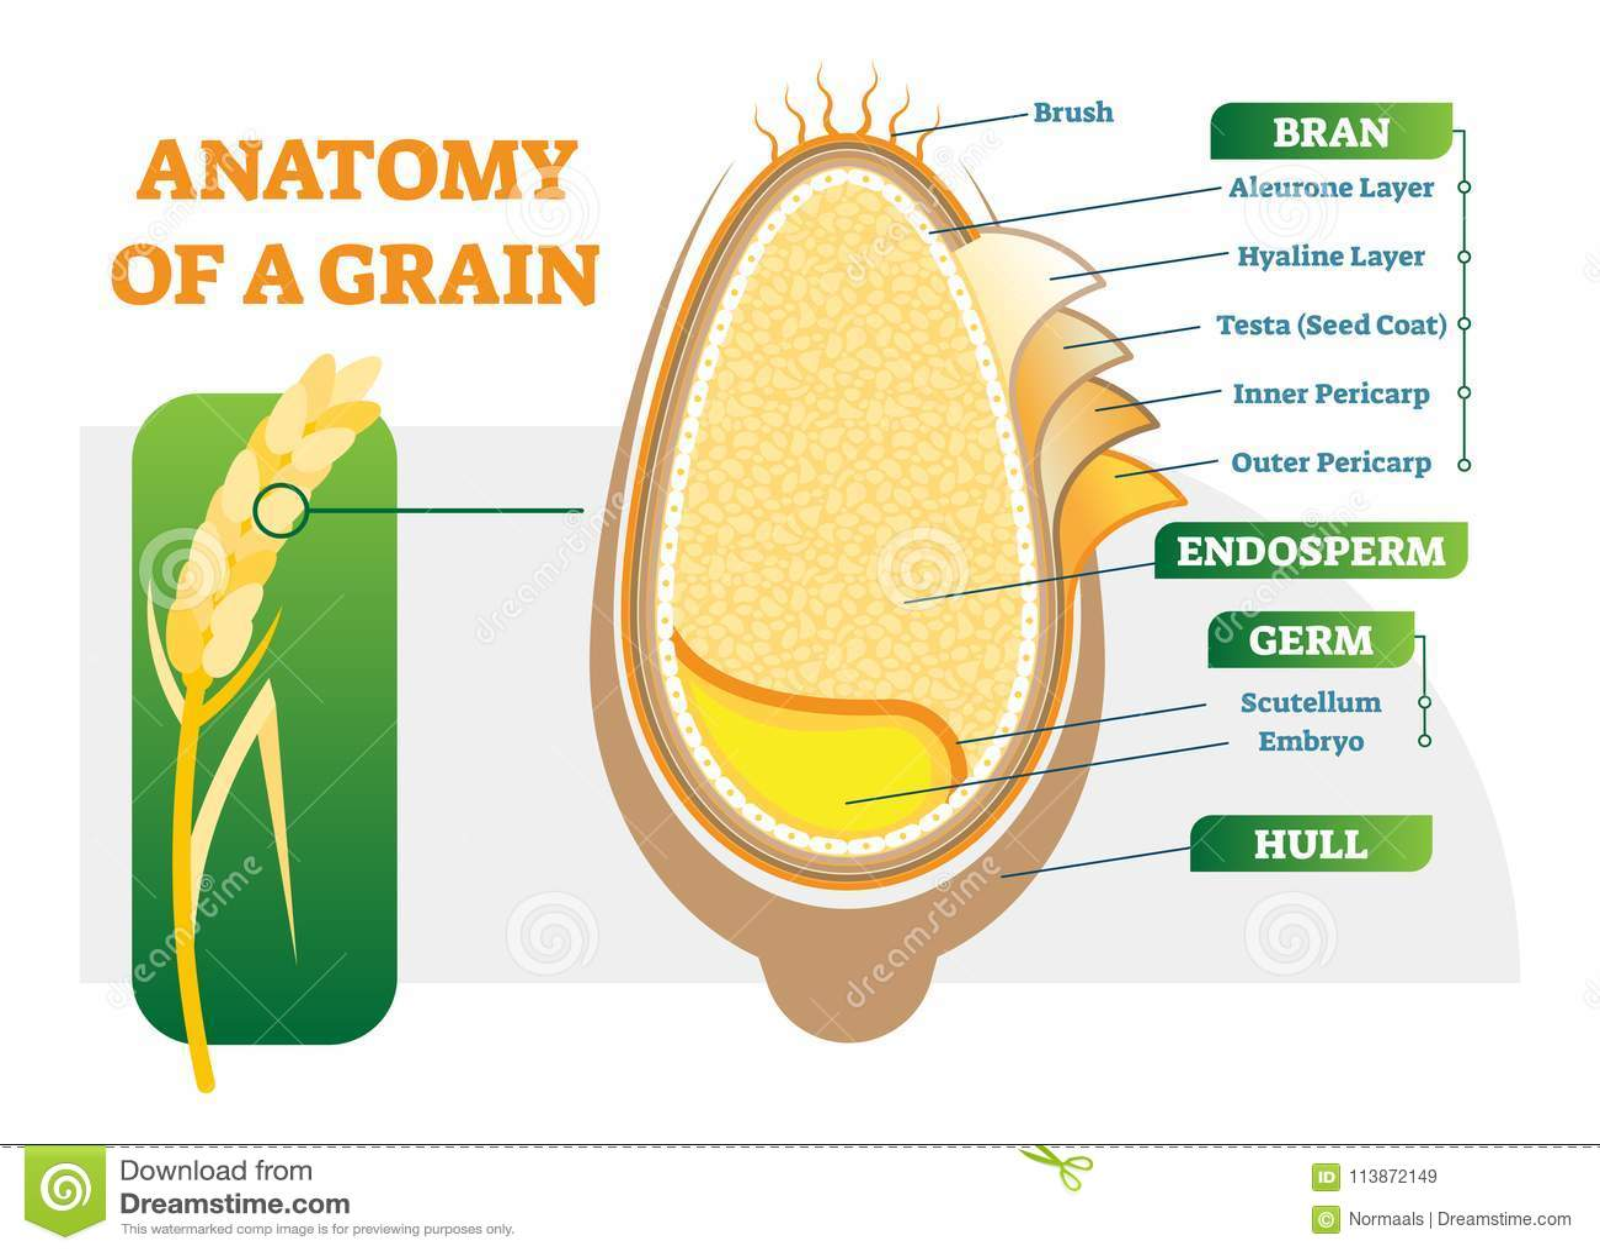 Grain Anatomical Layers Vector Illustration Diagram. Stock Vector ...